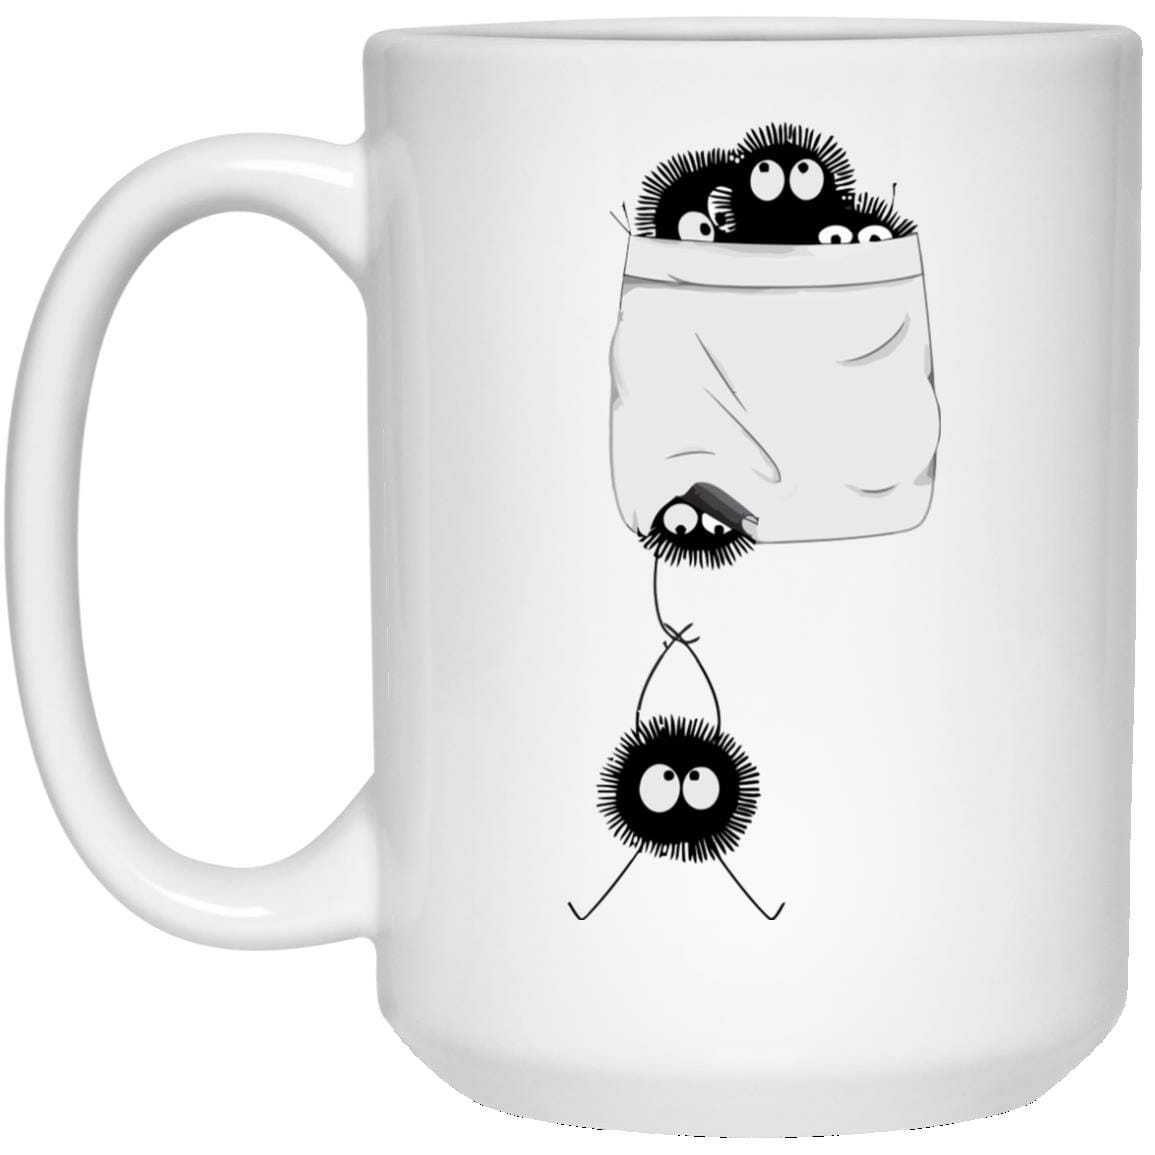 Spirited Away – Soot Ball in pocket Mug